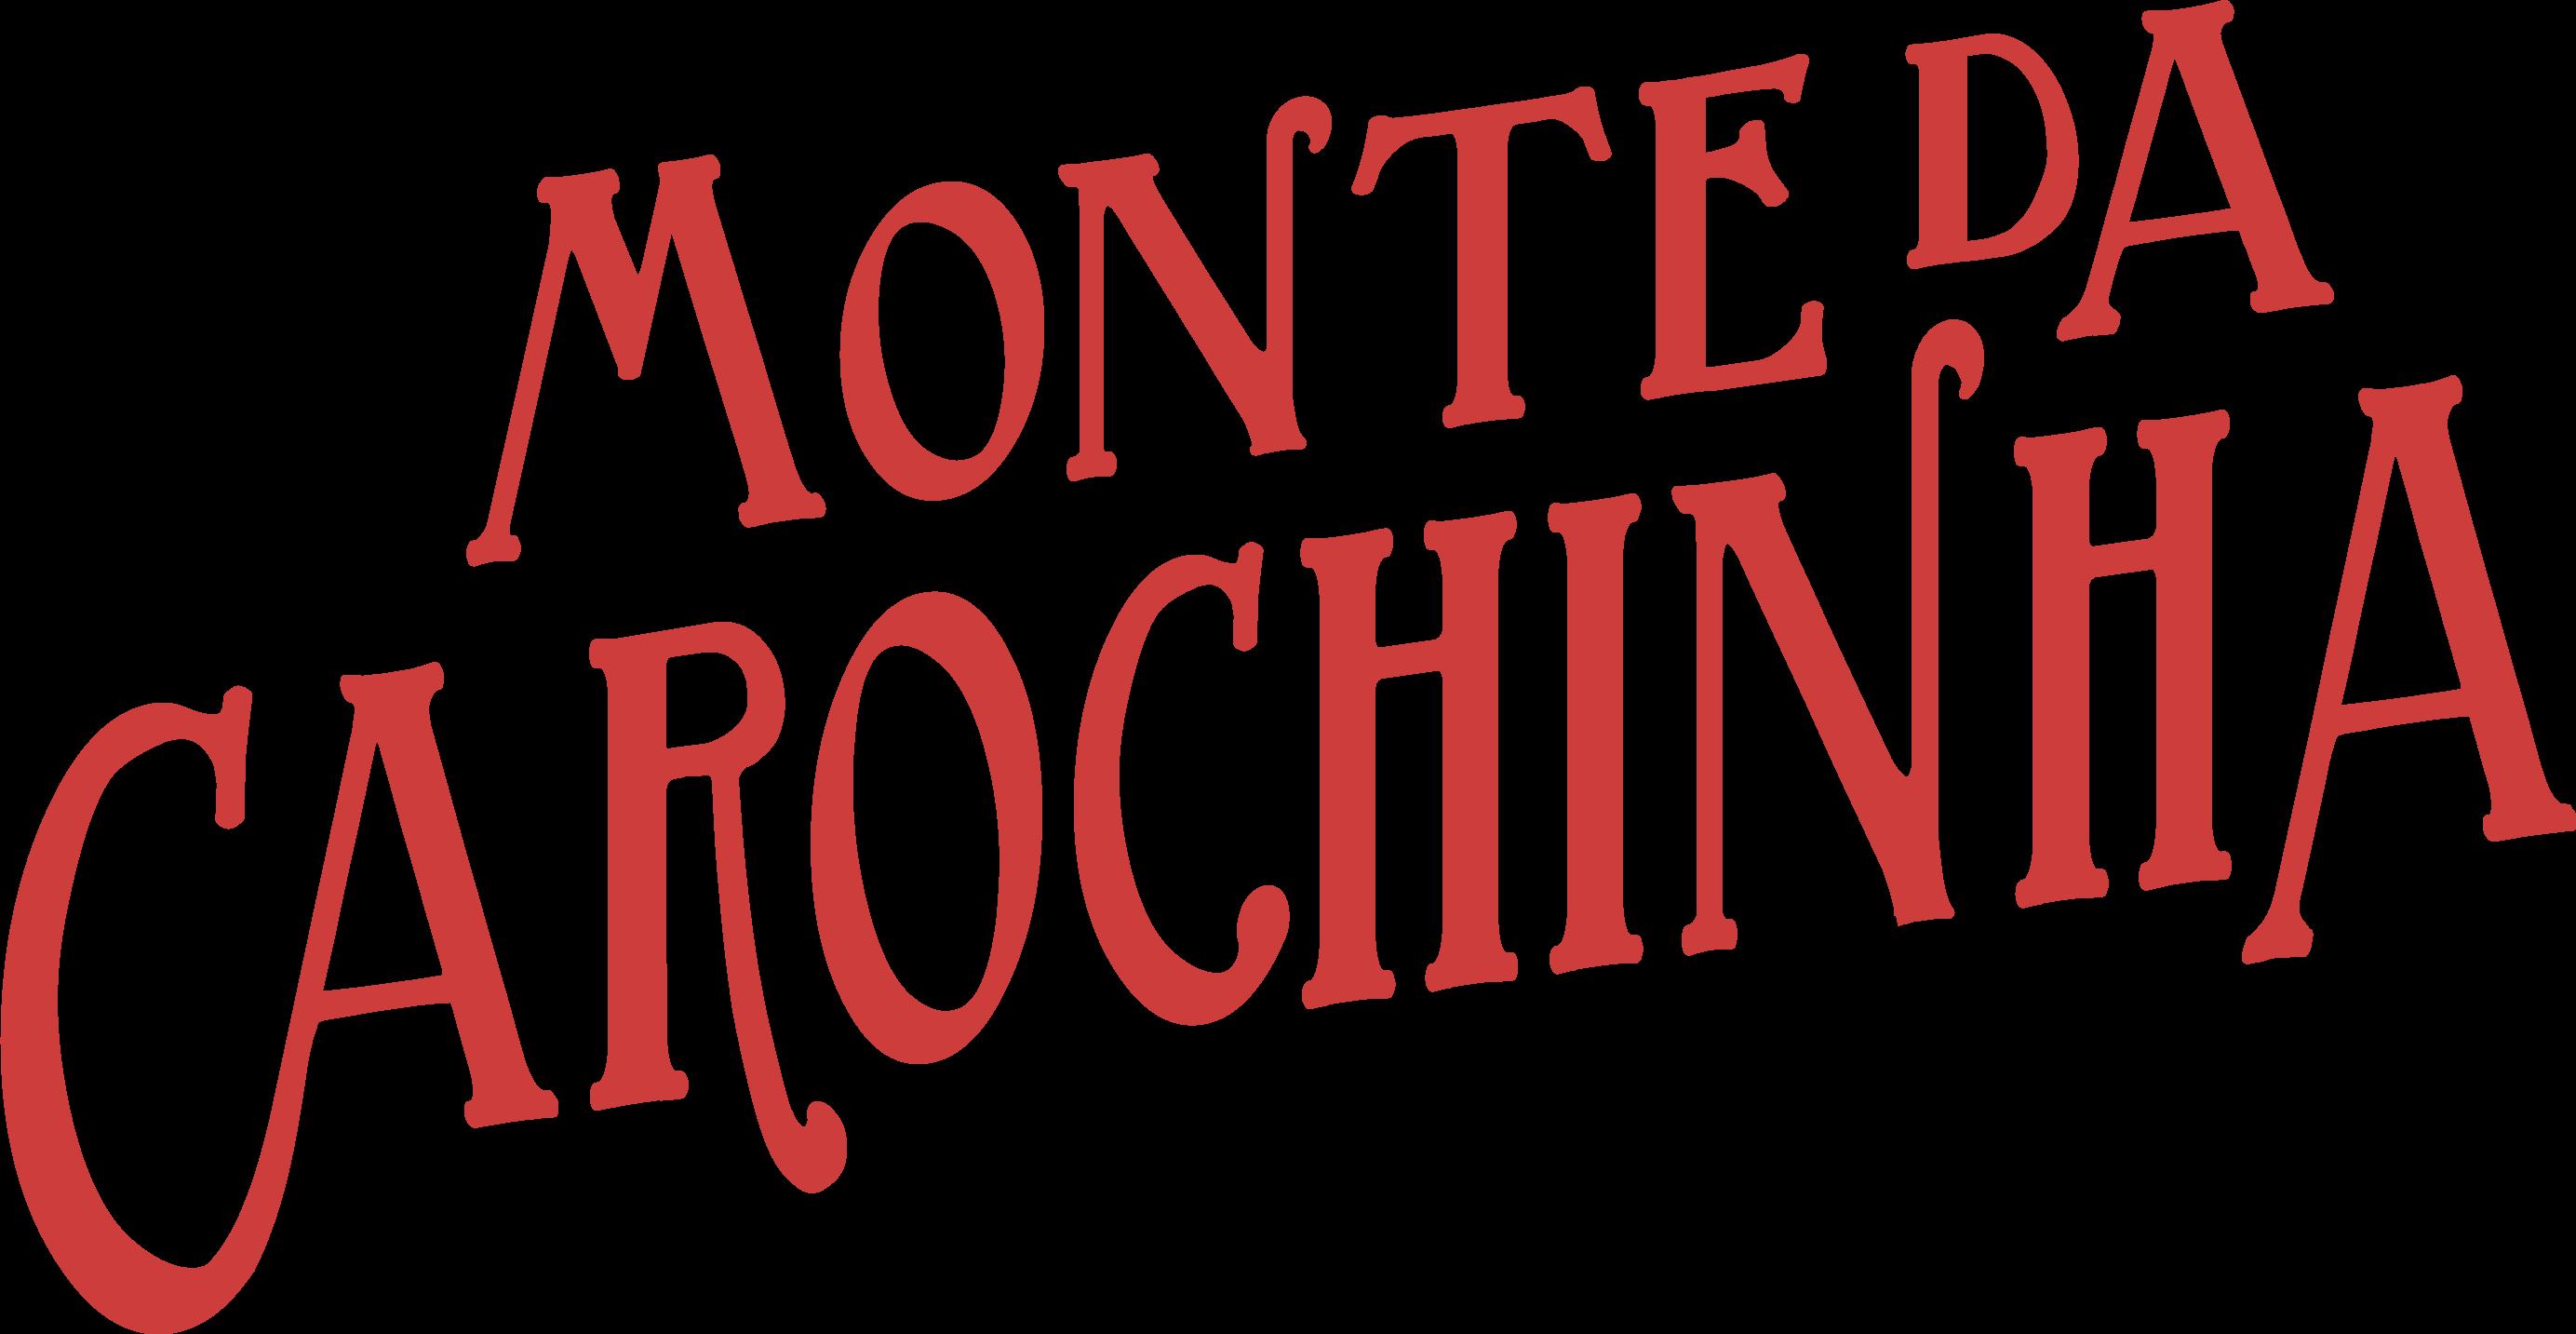 Monte da Carochinha